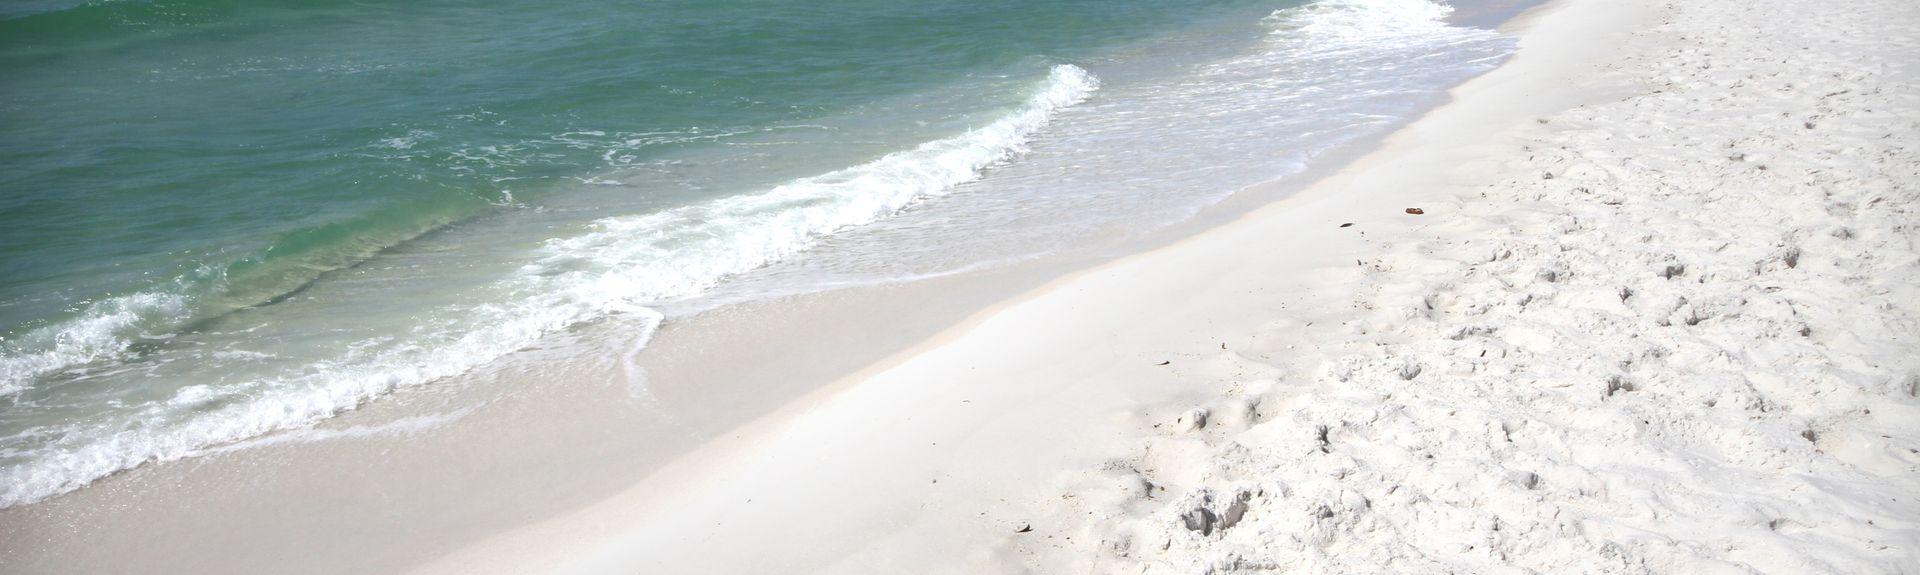 Beachview (Gulf Shores, Alabama, États-Unis d'Amérique)